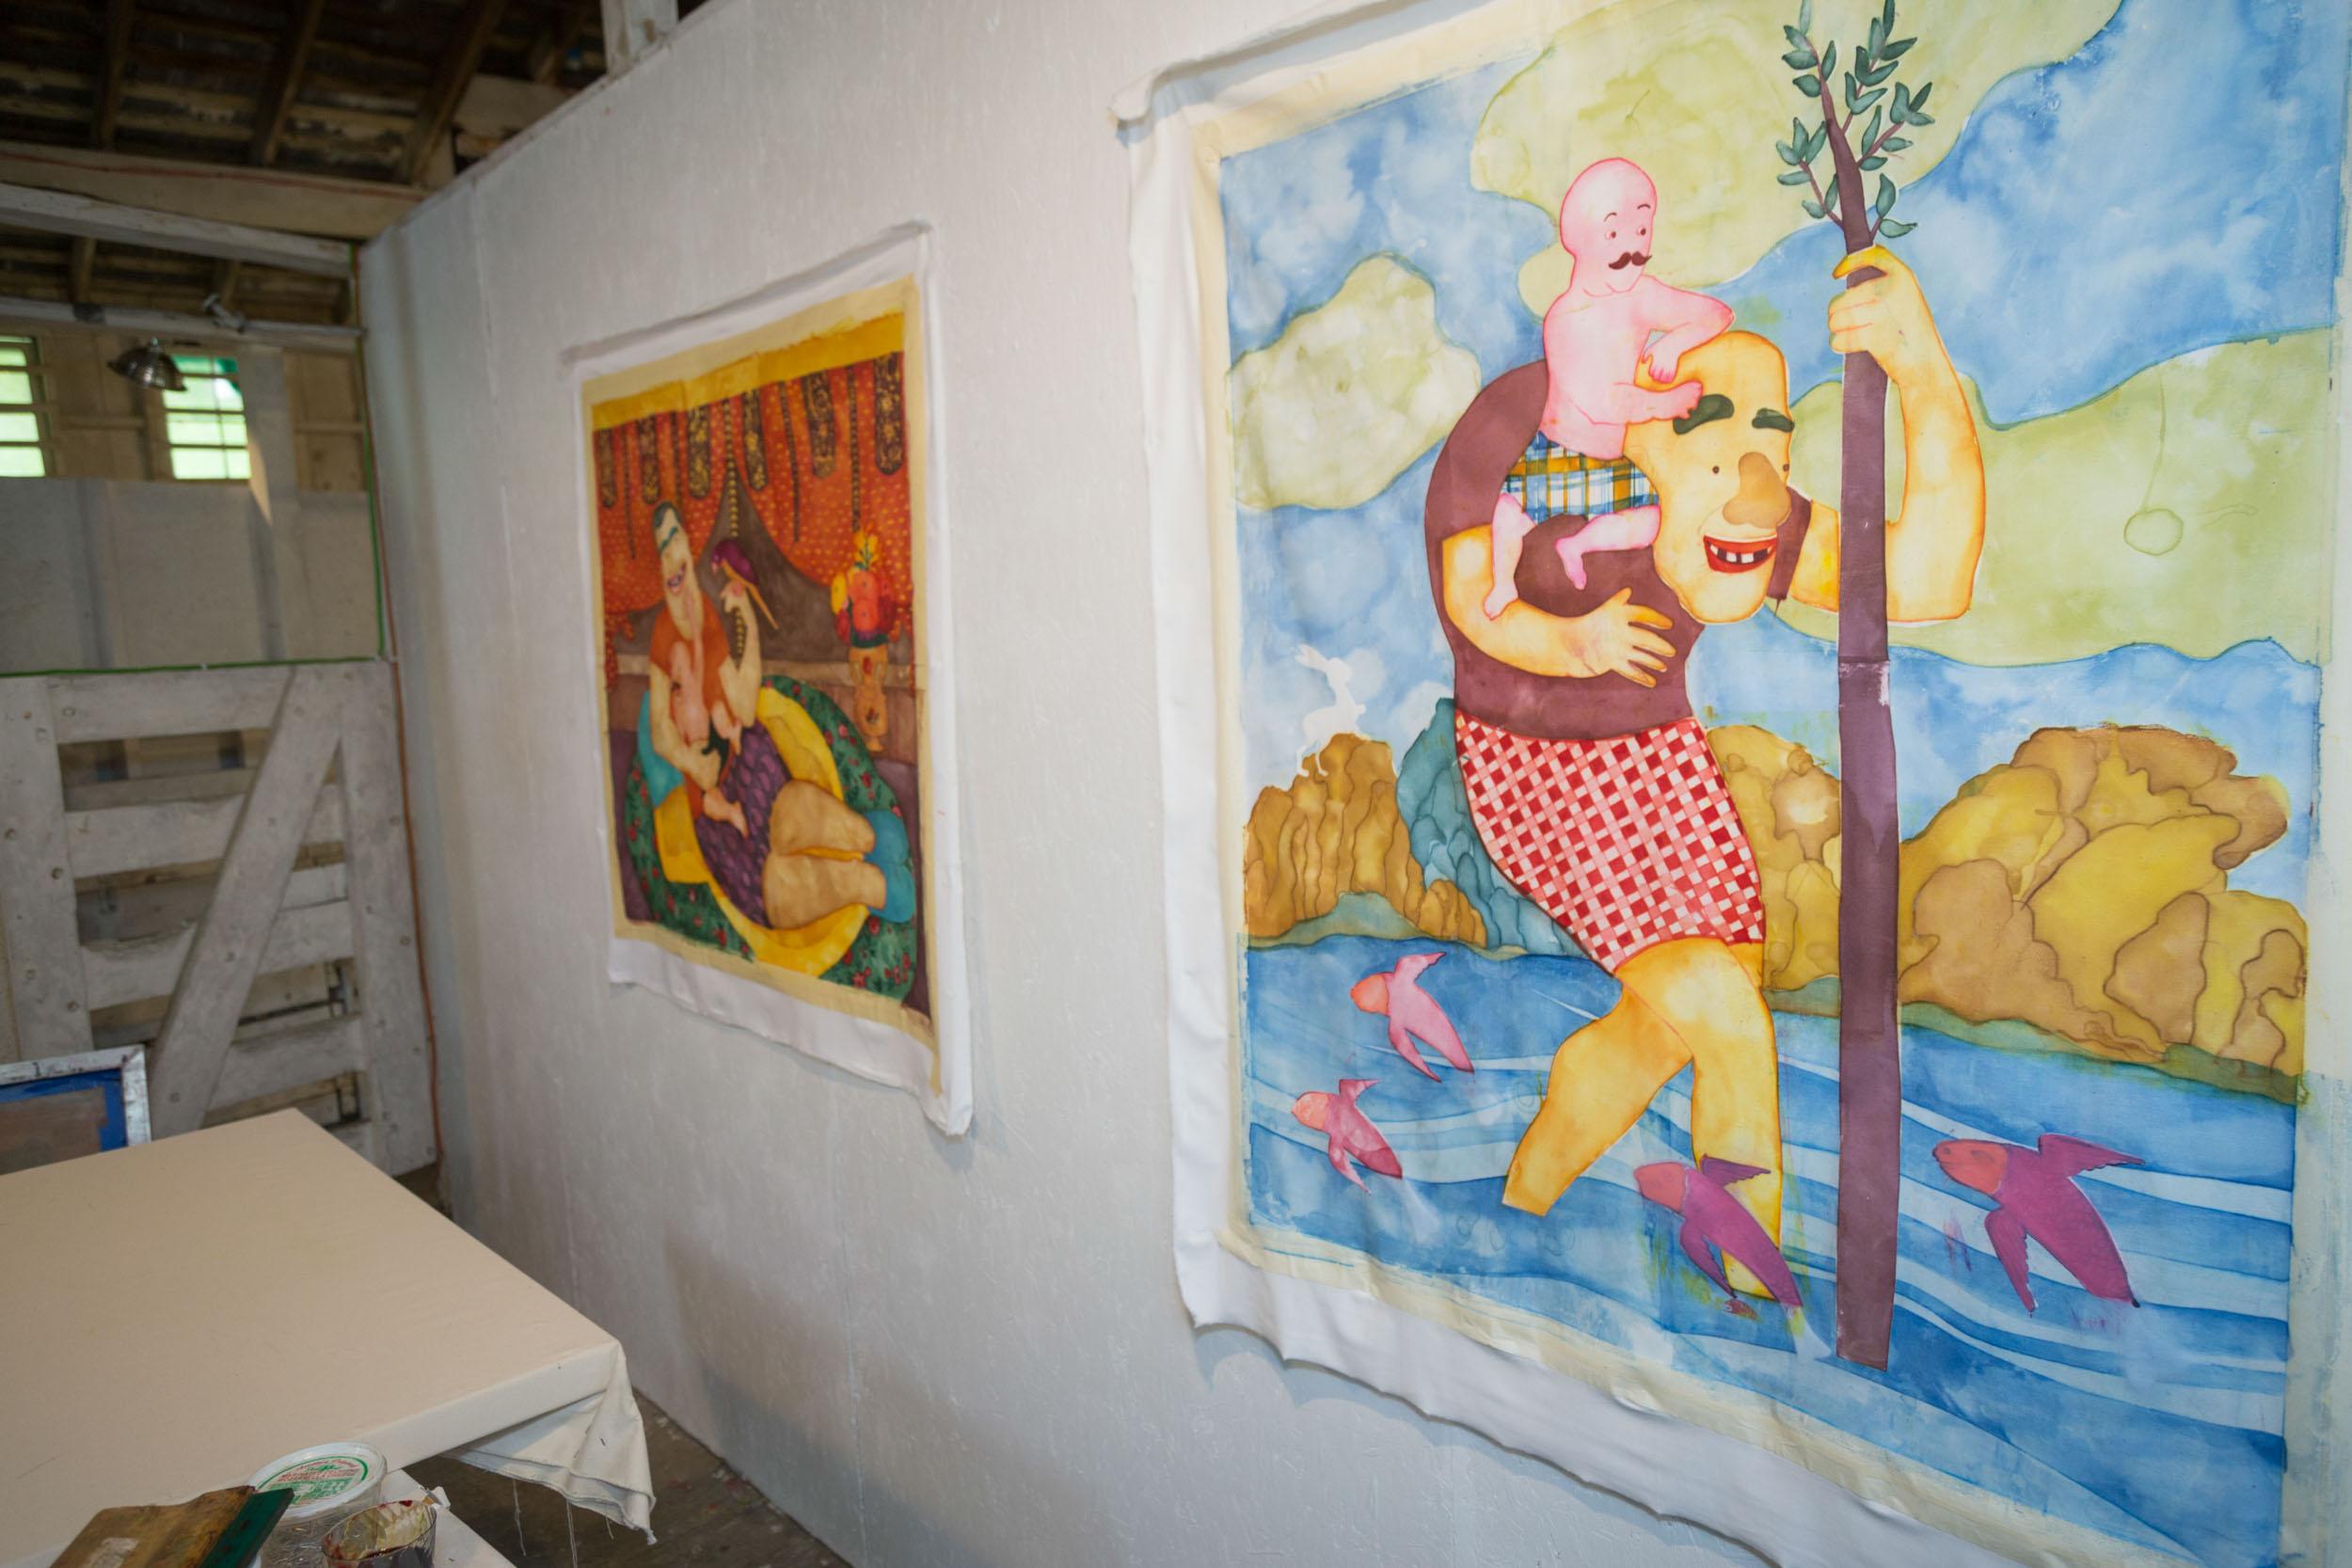 wassaic-project-artist-orkideh-torabi-2018-05-22-14-36-10.jpg